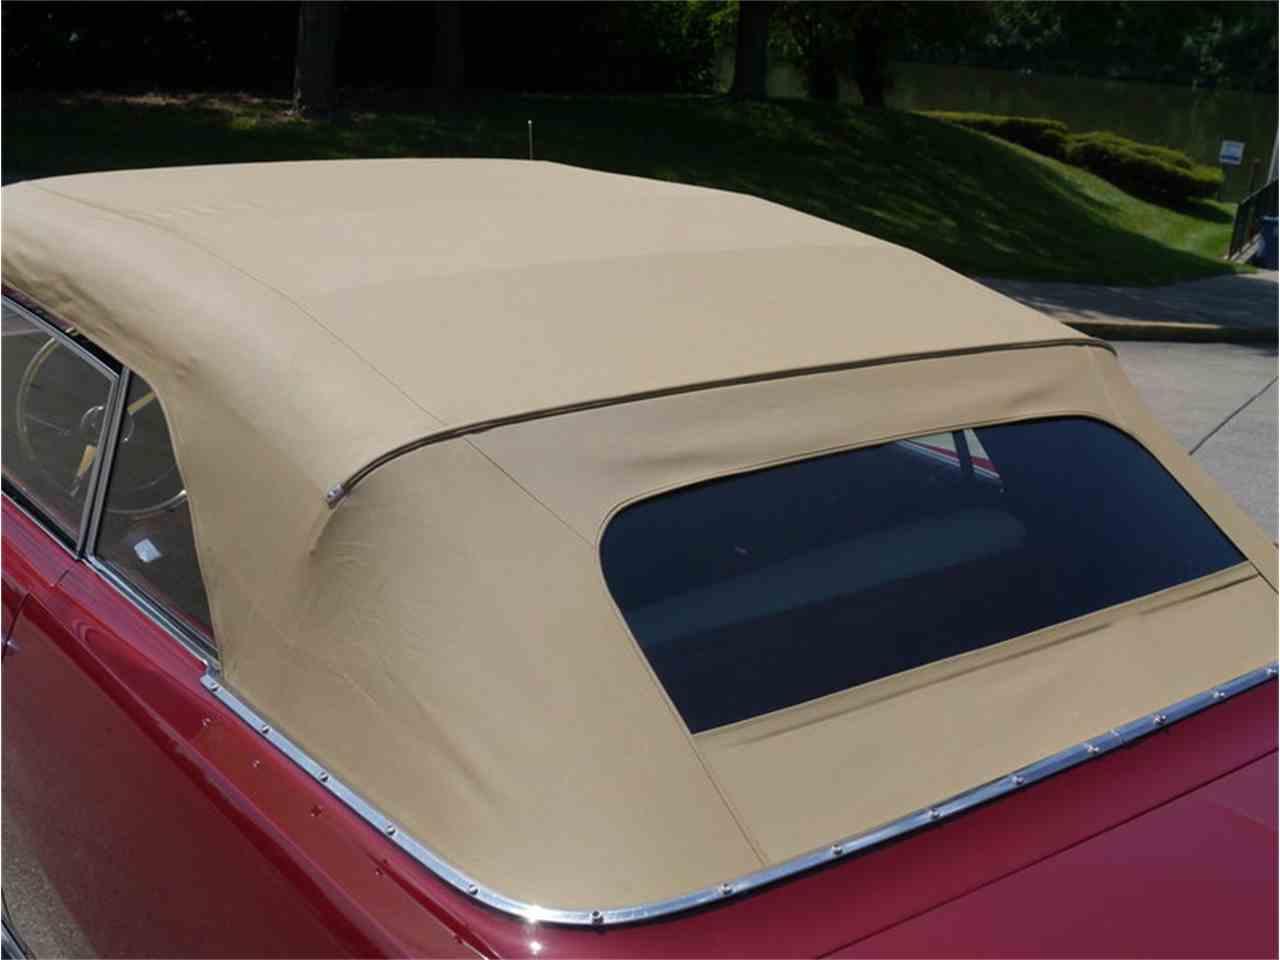 Large Picture of '63 Pontiac Bonneville located in Alsip Illinois - $29,900.00 - LAZG